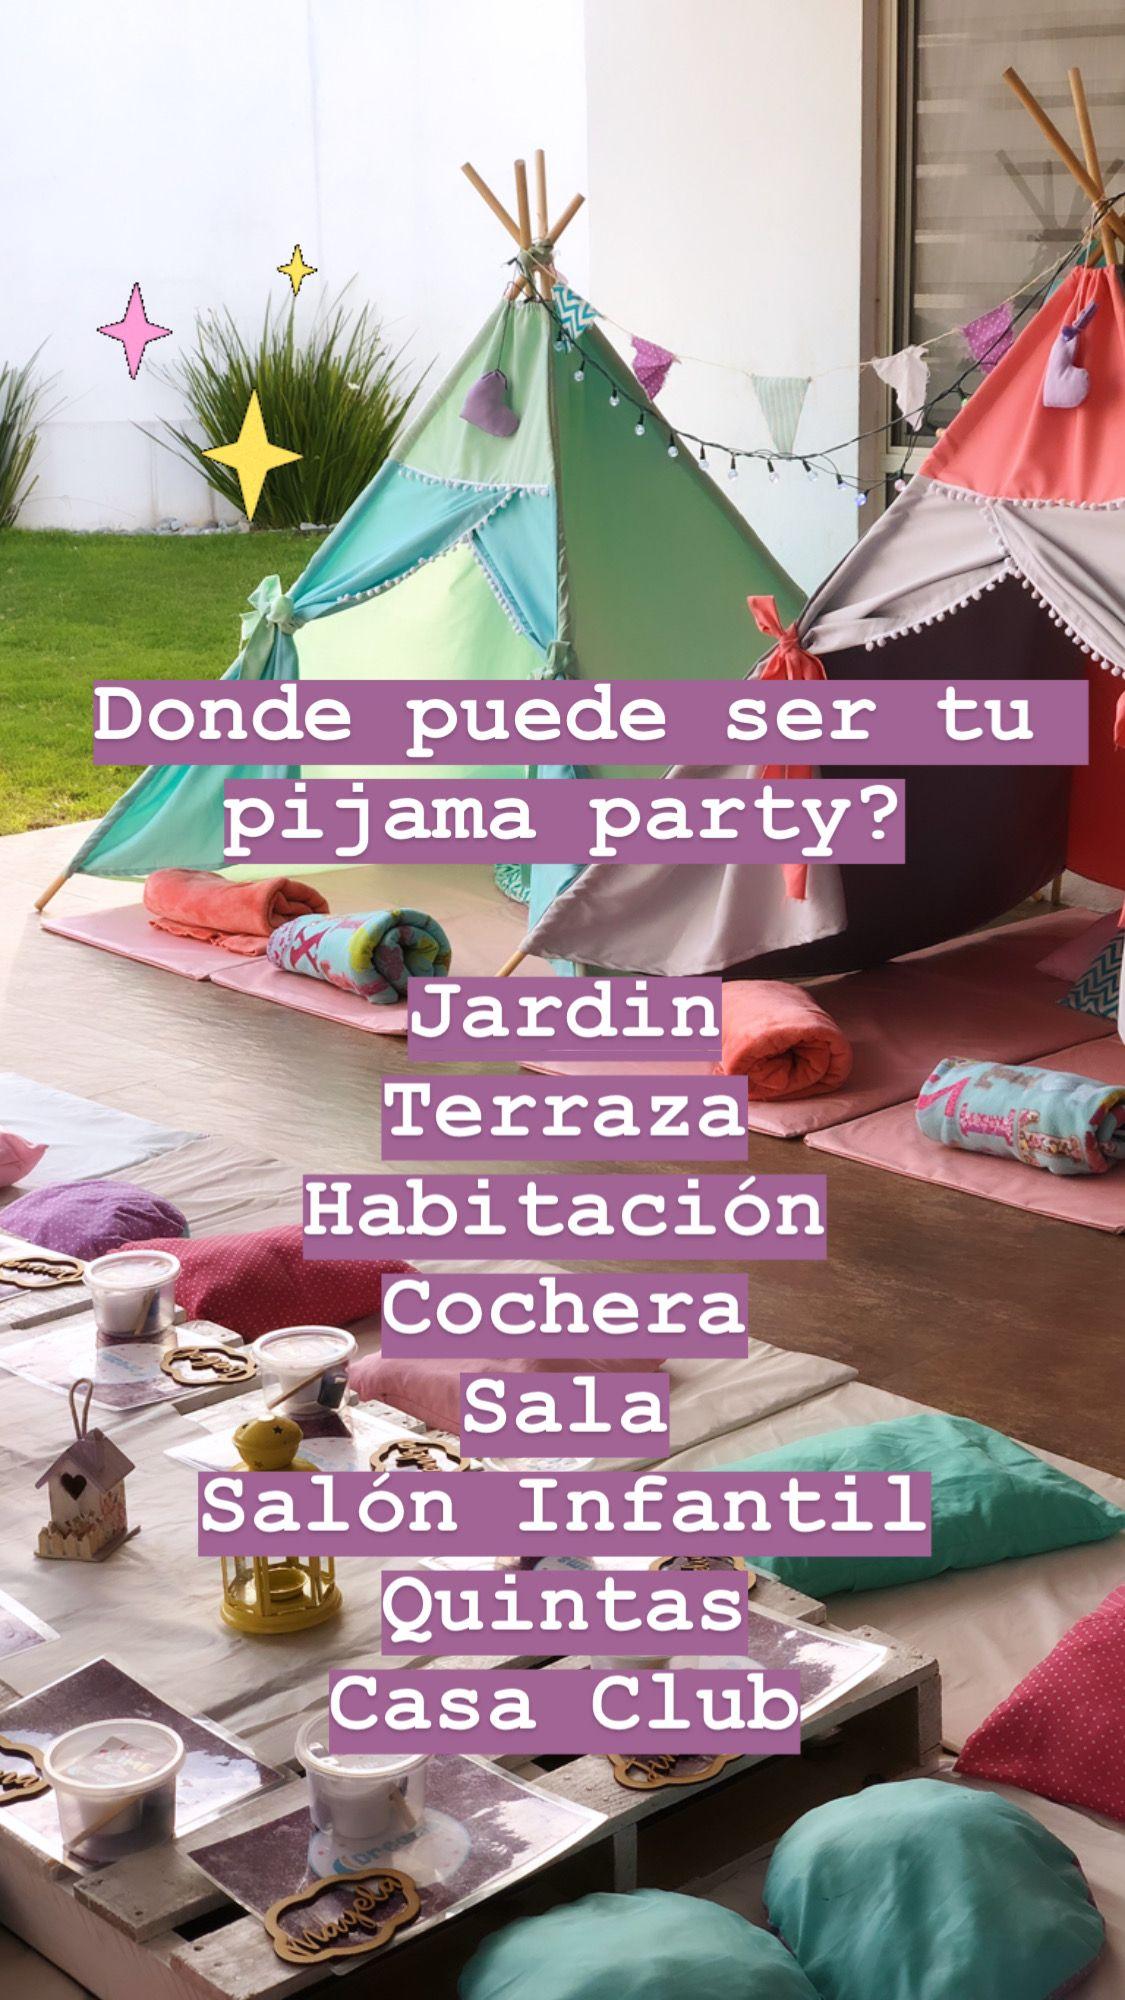 Dreams Pijamadas Nl En 2020 Salones Terraza Pijama